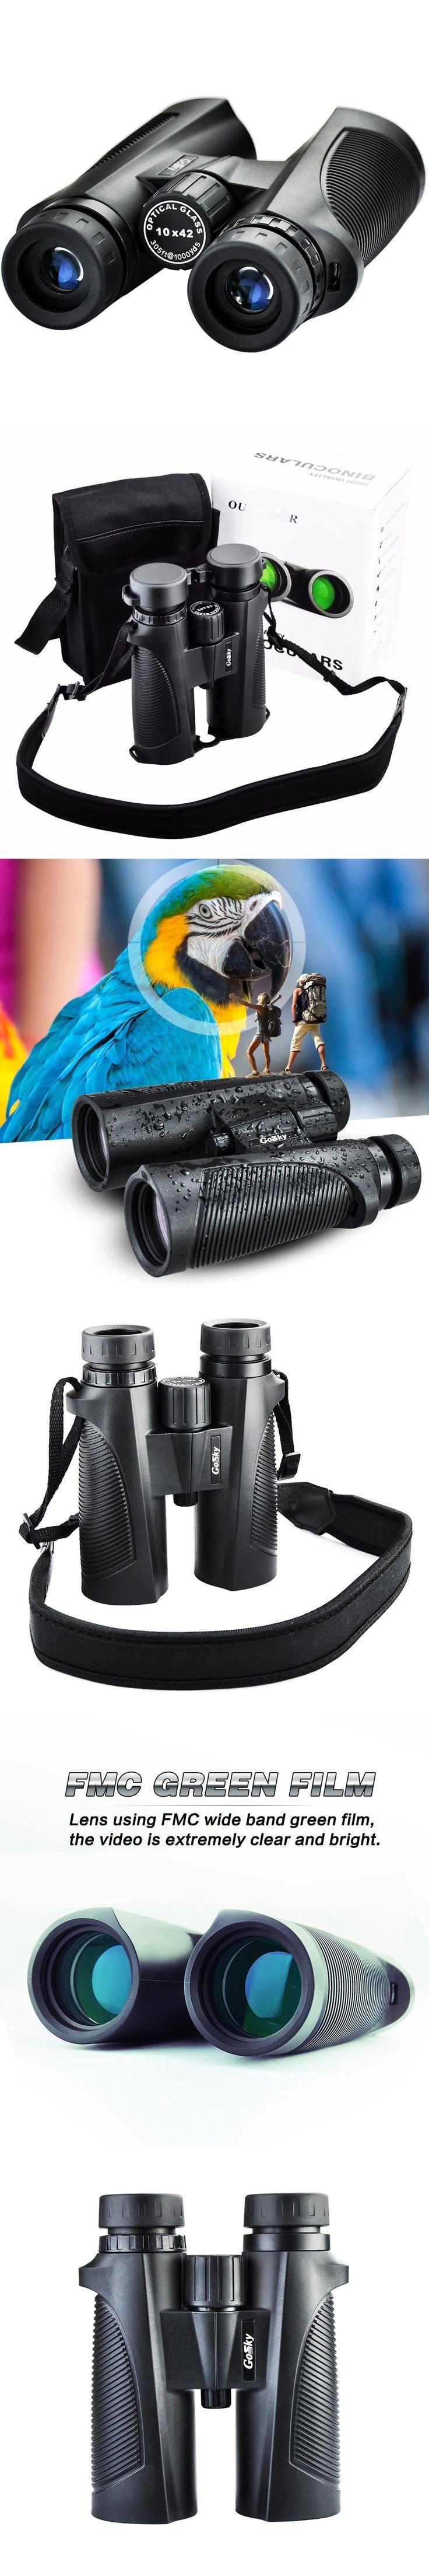 10X42 Prism Binocular - Waterproof /Fog-proof/Shockproof Grip Scope -FMC Green Film Optical Lens